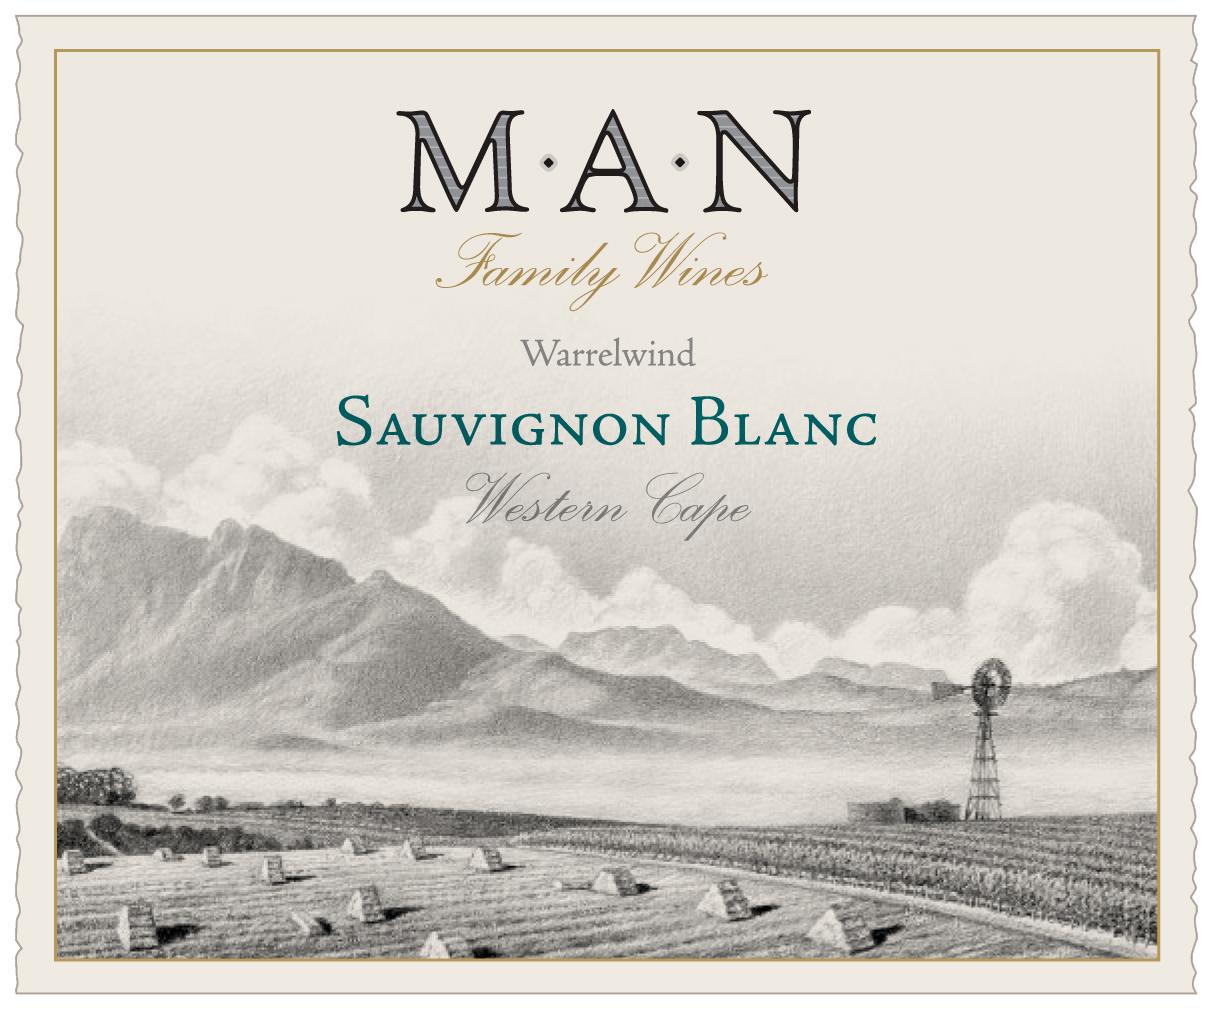 Man Family Wines Sauvignon Blanc Label_NEW.jpg